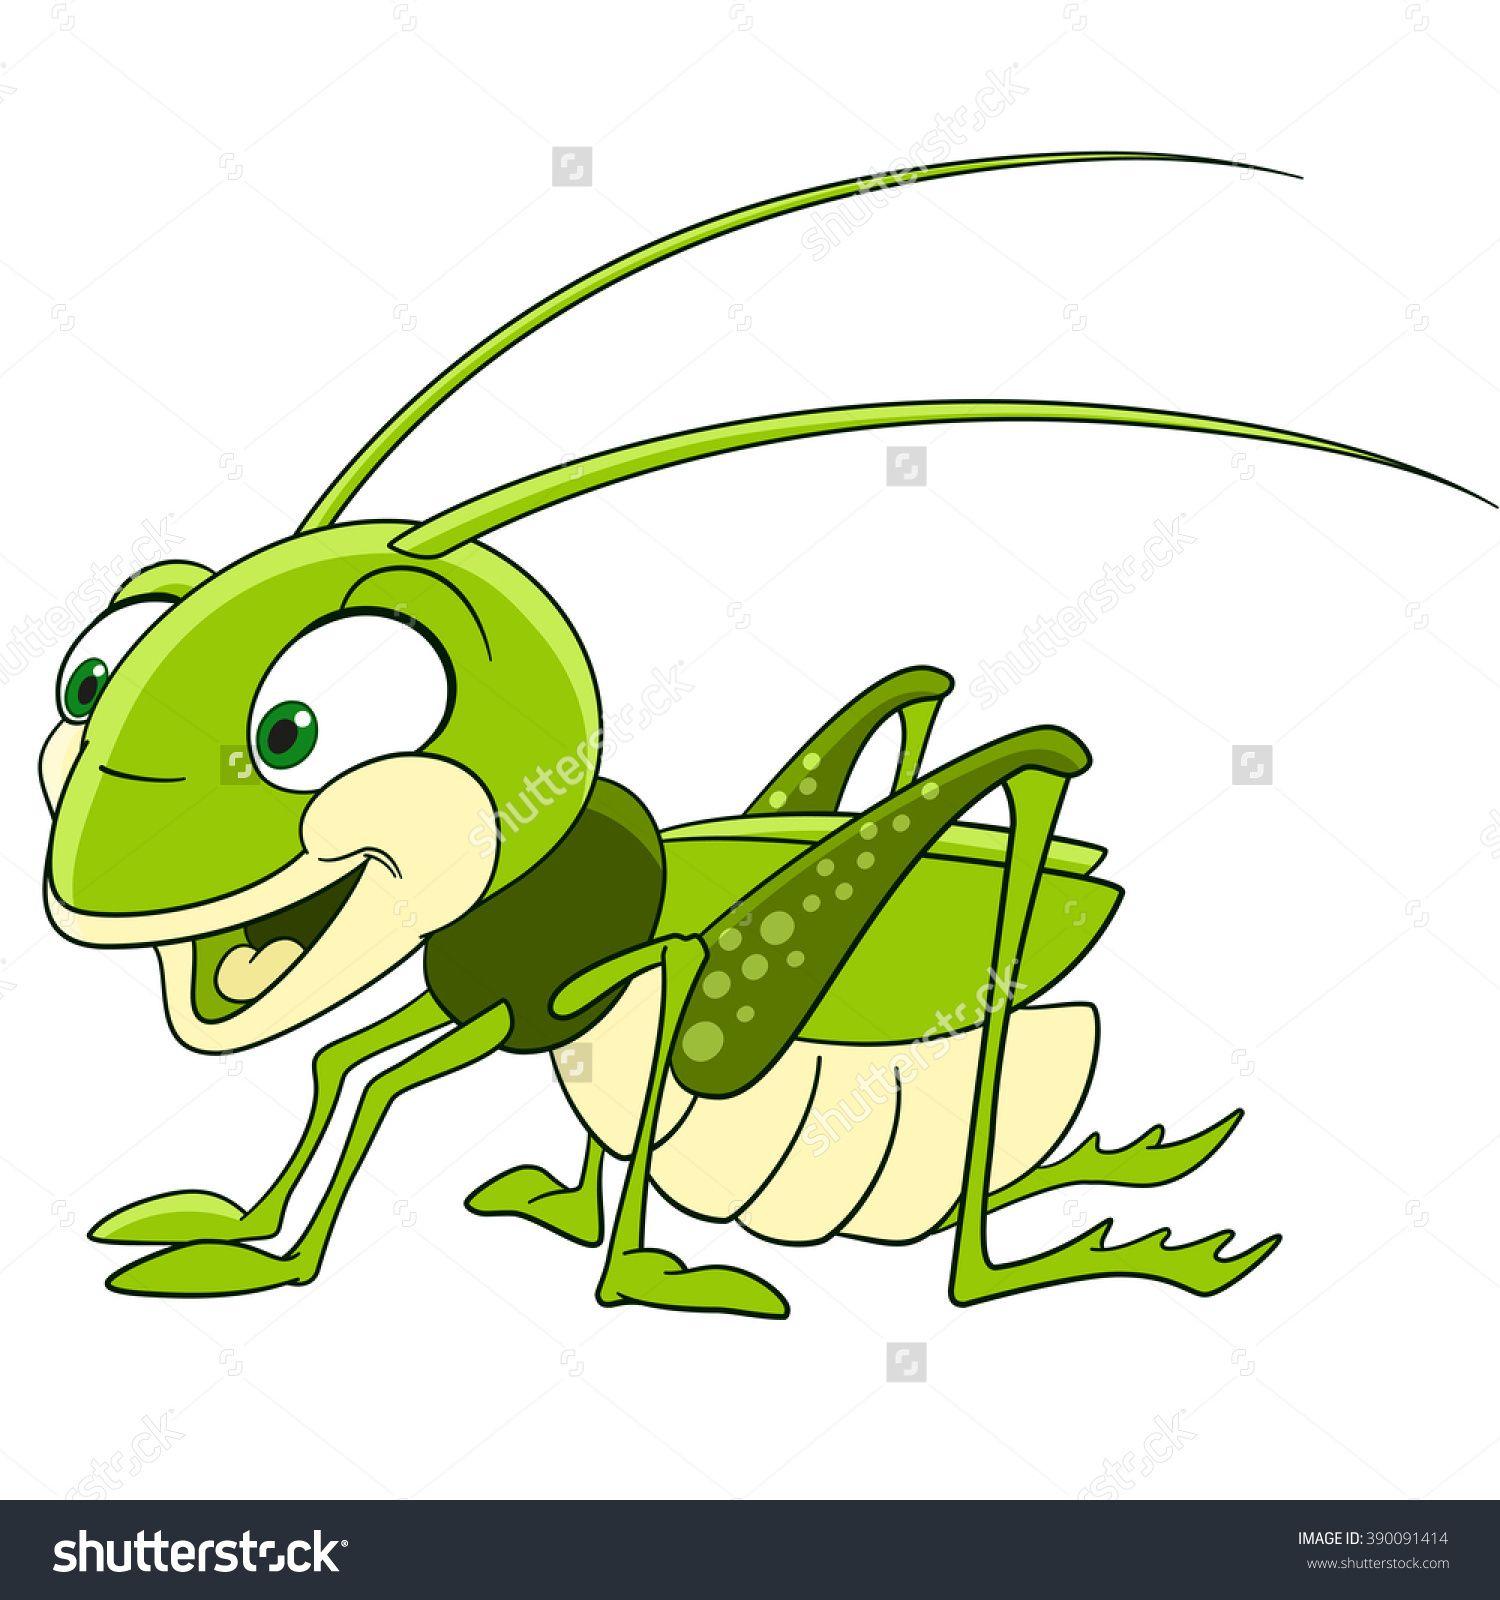 Cute And Funny Smiling Cartoon Grasshopper (Locust, Katydid ...